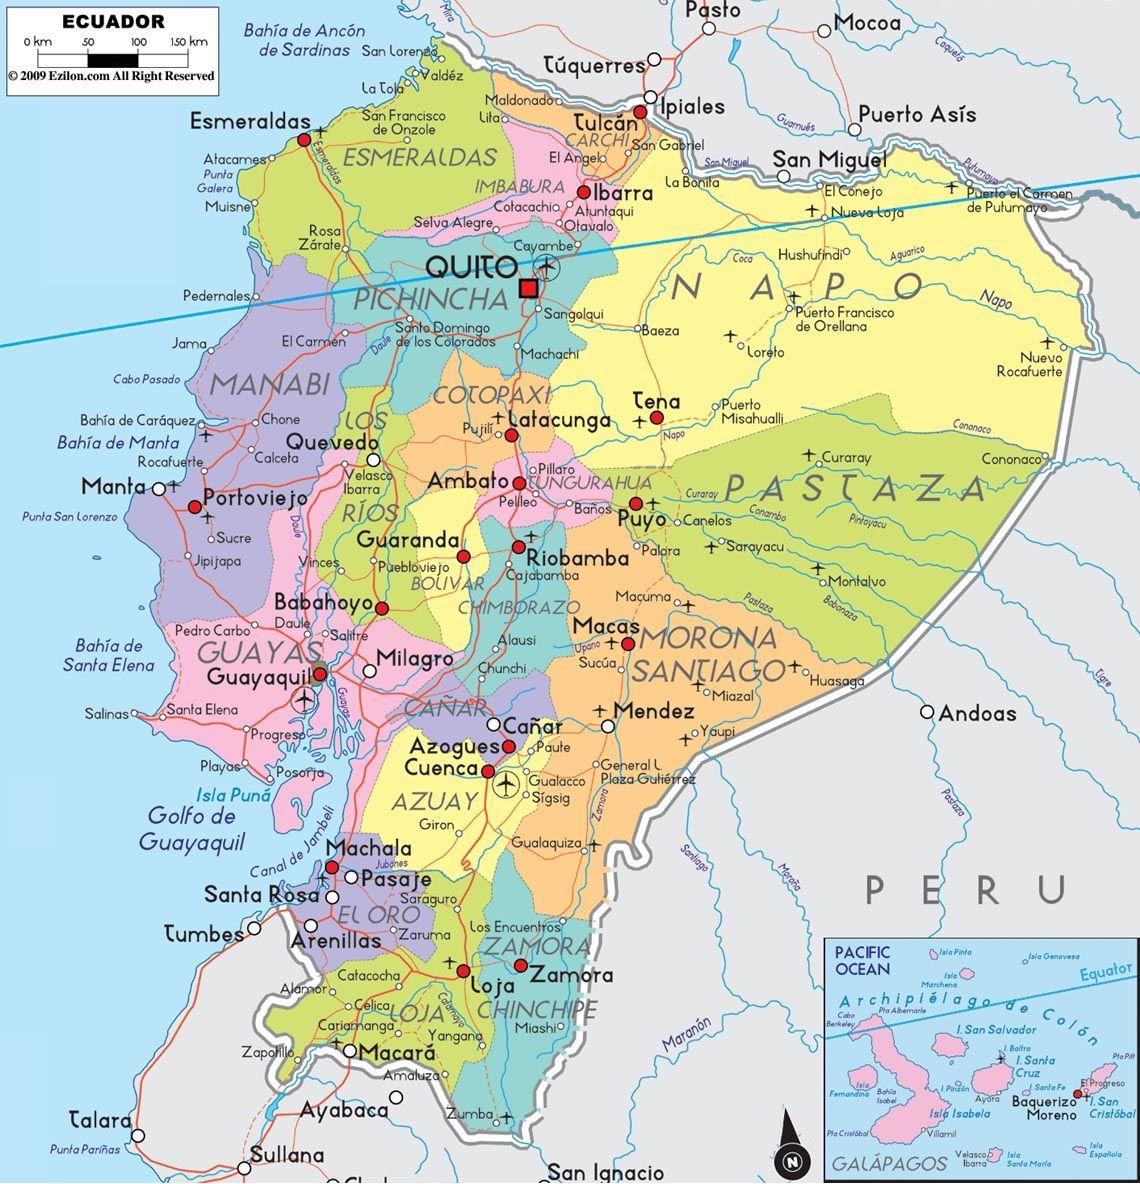 Ecuador Ecuador Map South America Map Political Map